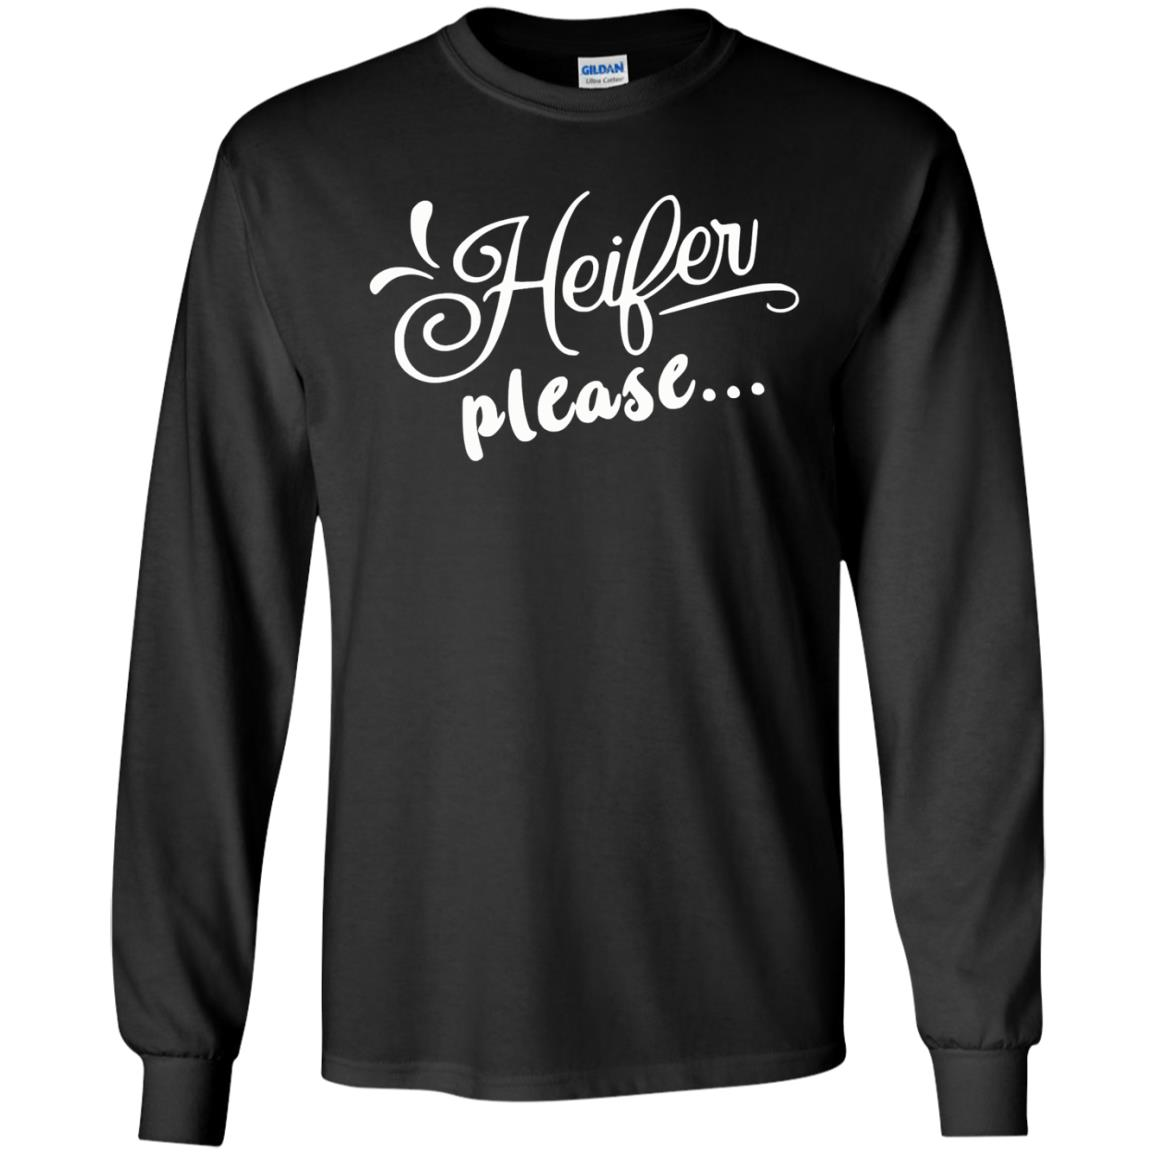 image 2146 - Heifer Please shirt, sweater: funny farmer apparel